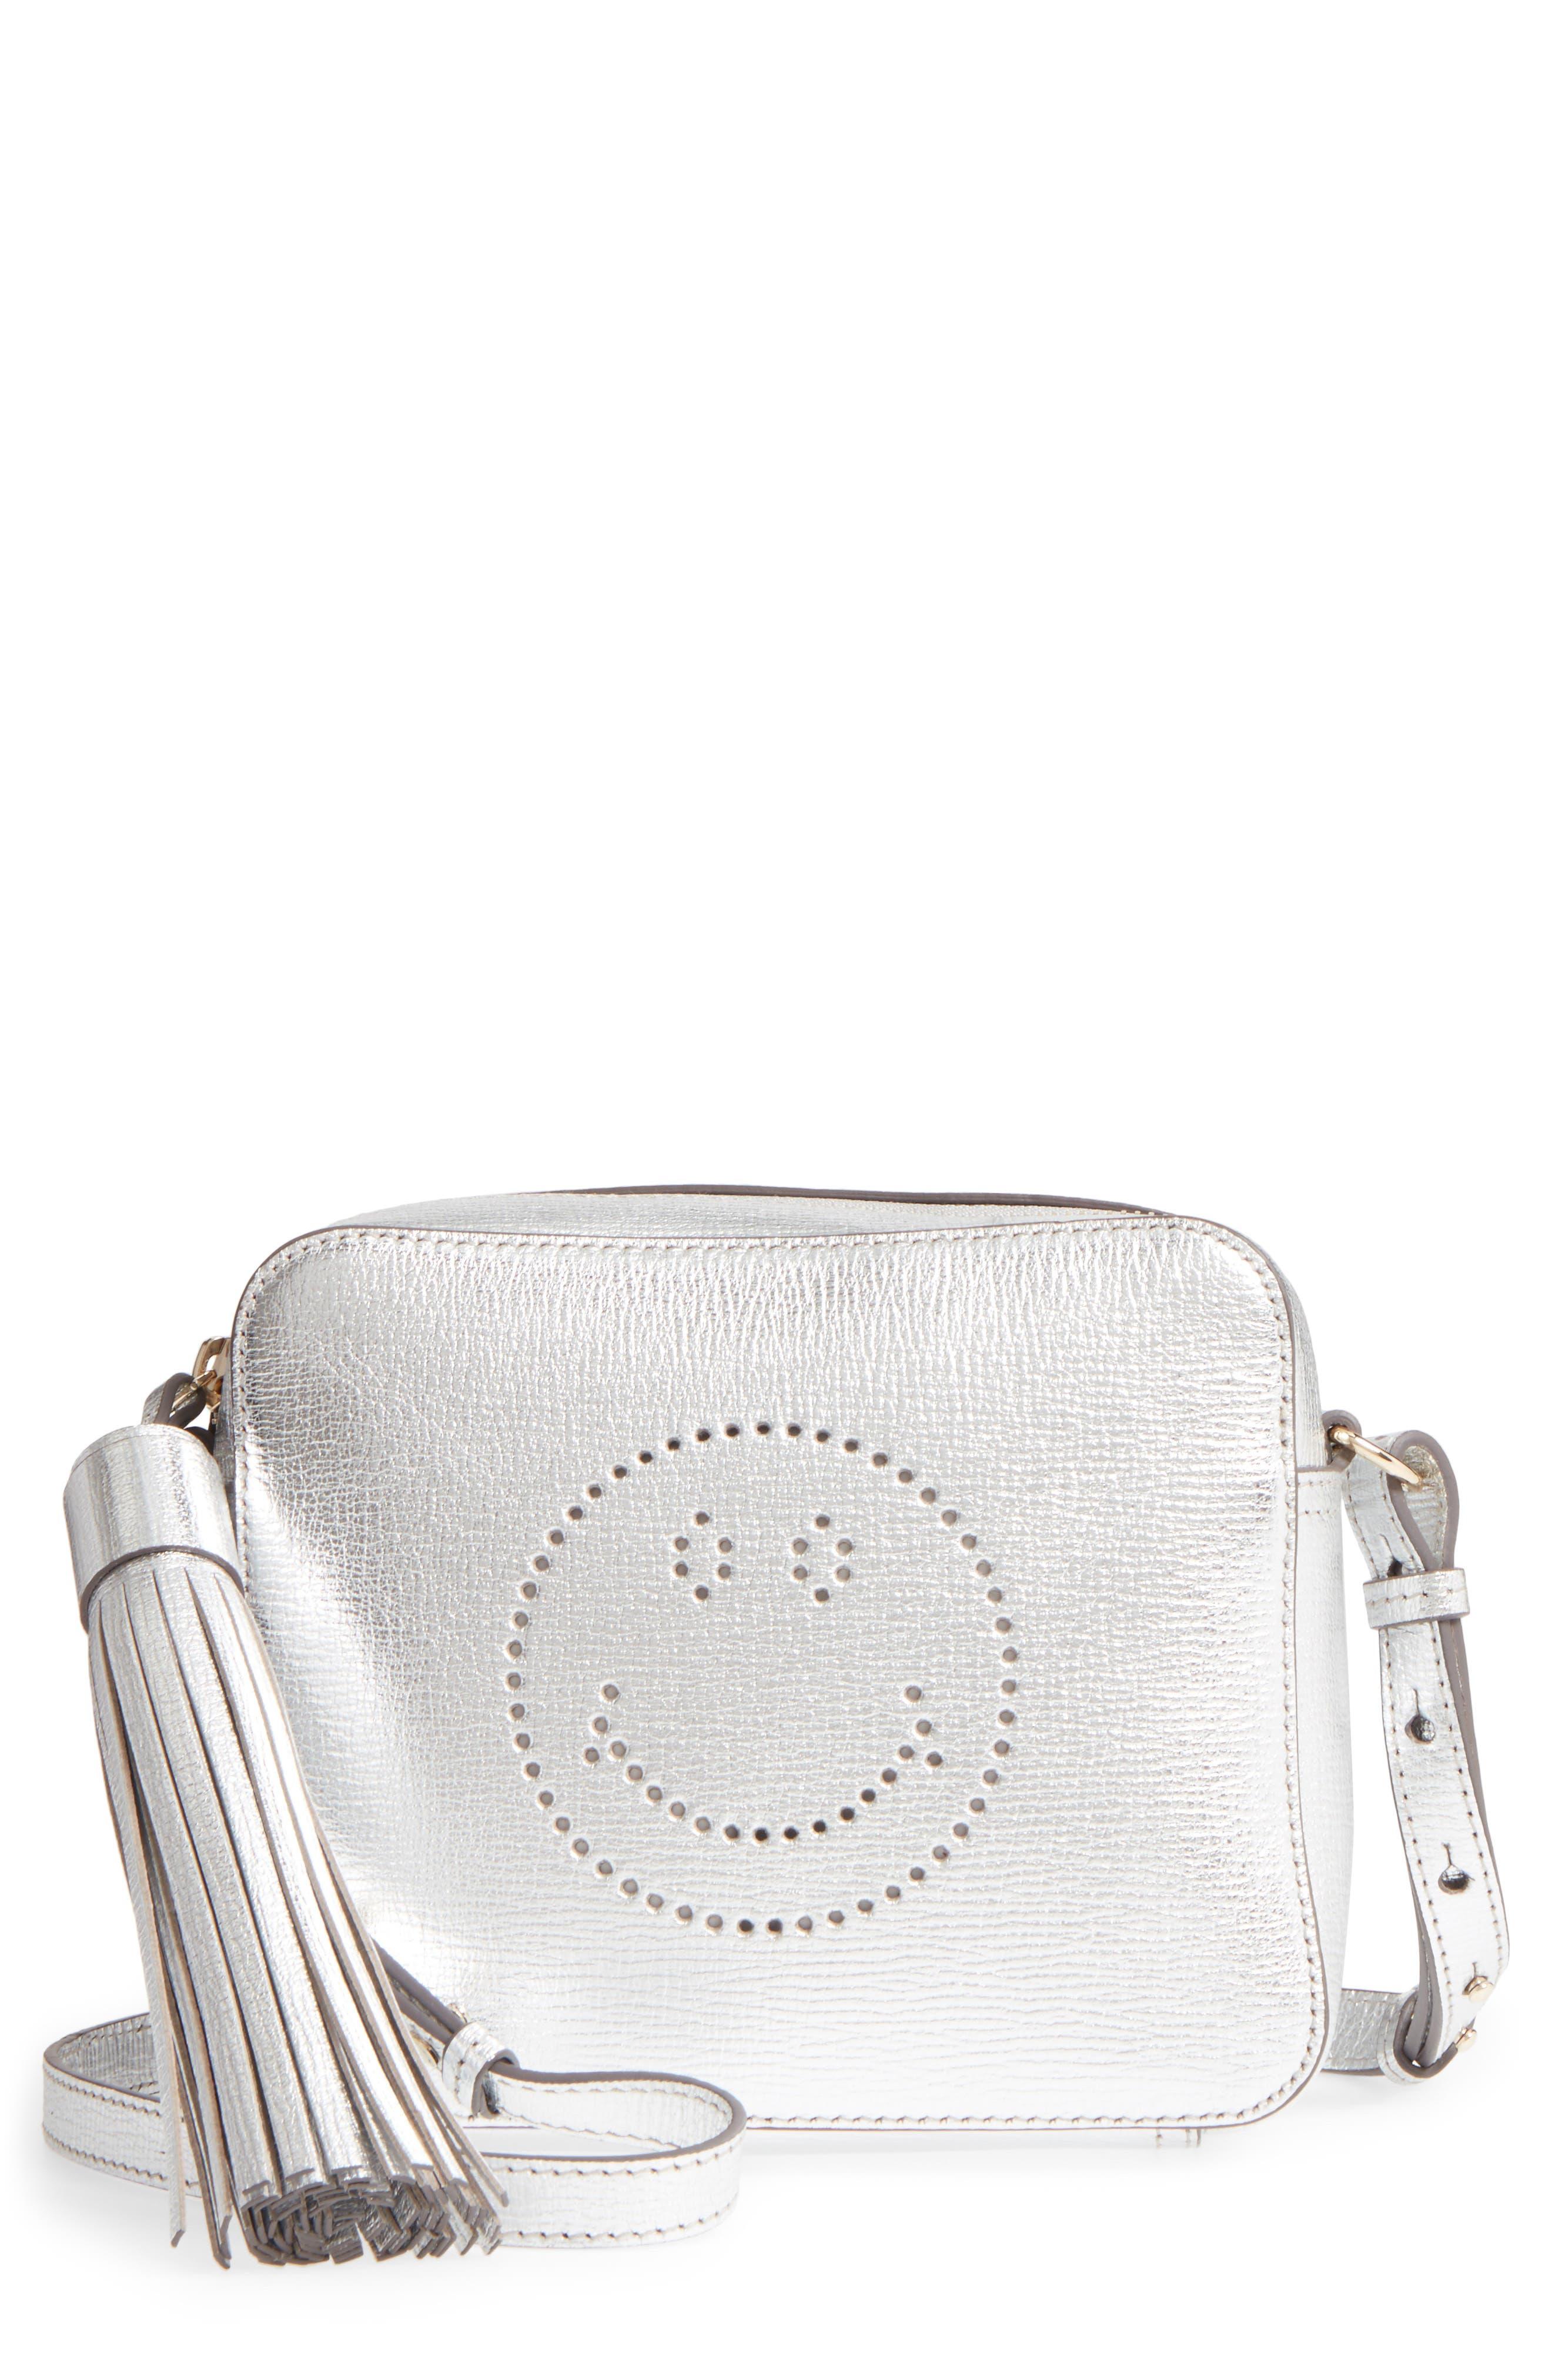 Smiley Metallic Leather Crossbody Bag,                             Main thumbnail 1, color,                             040